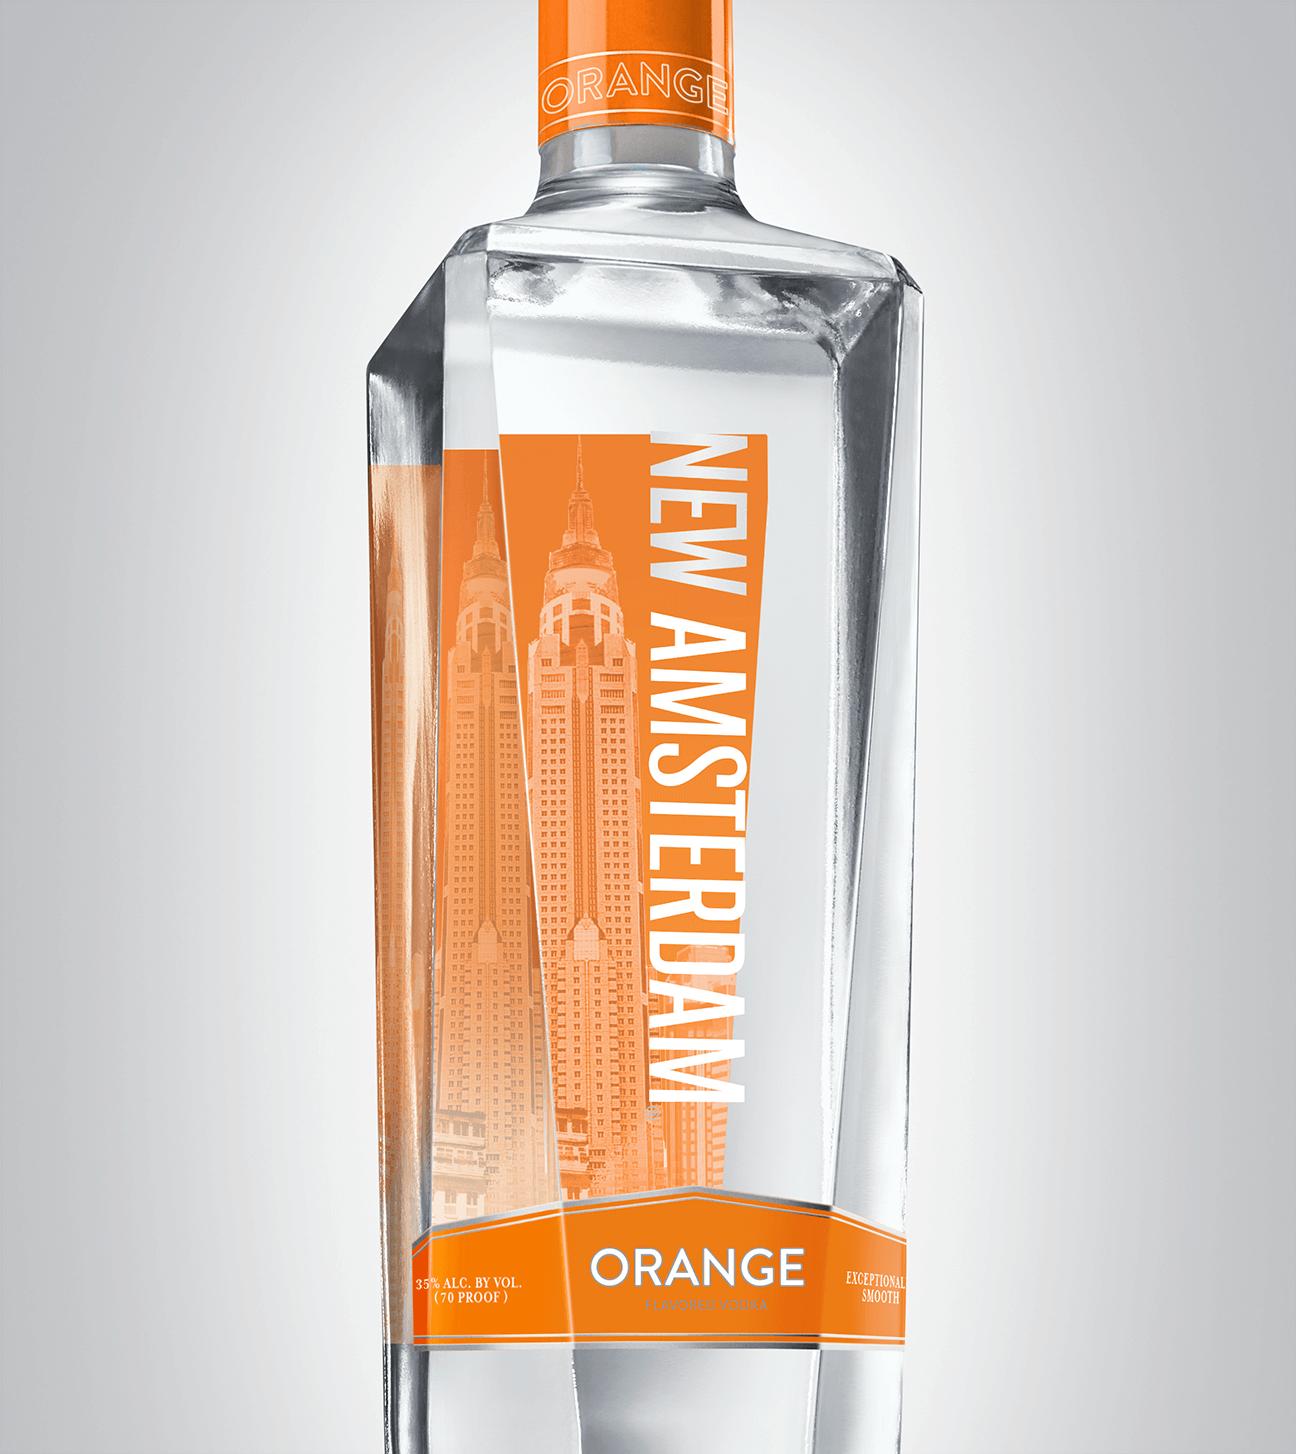 Bottle of New Amsterdam Orange